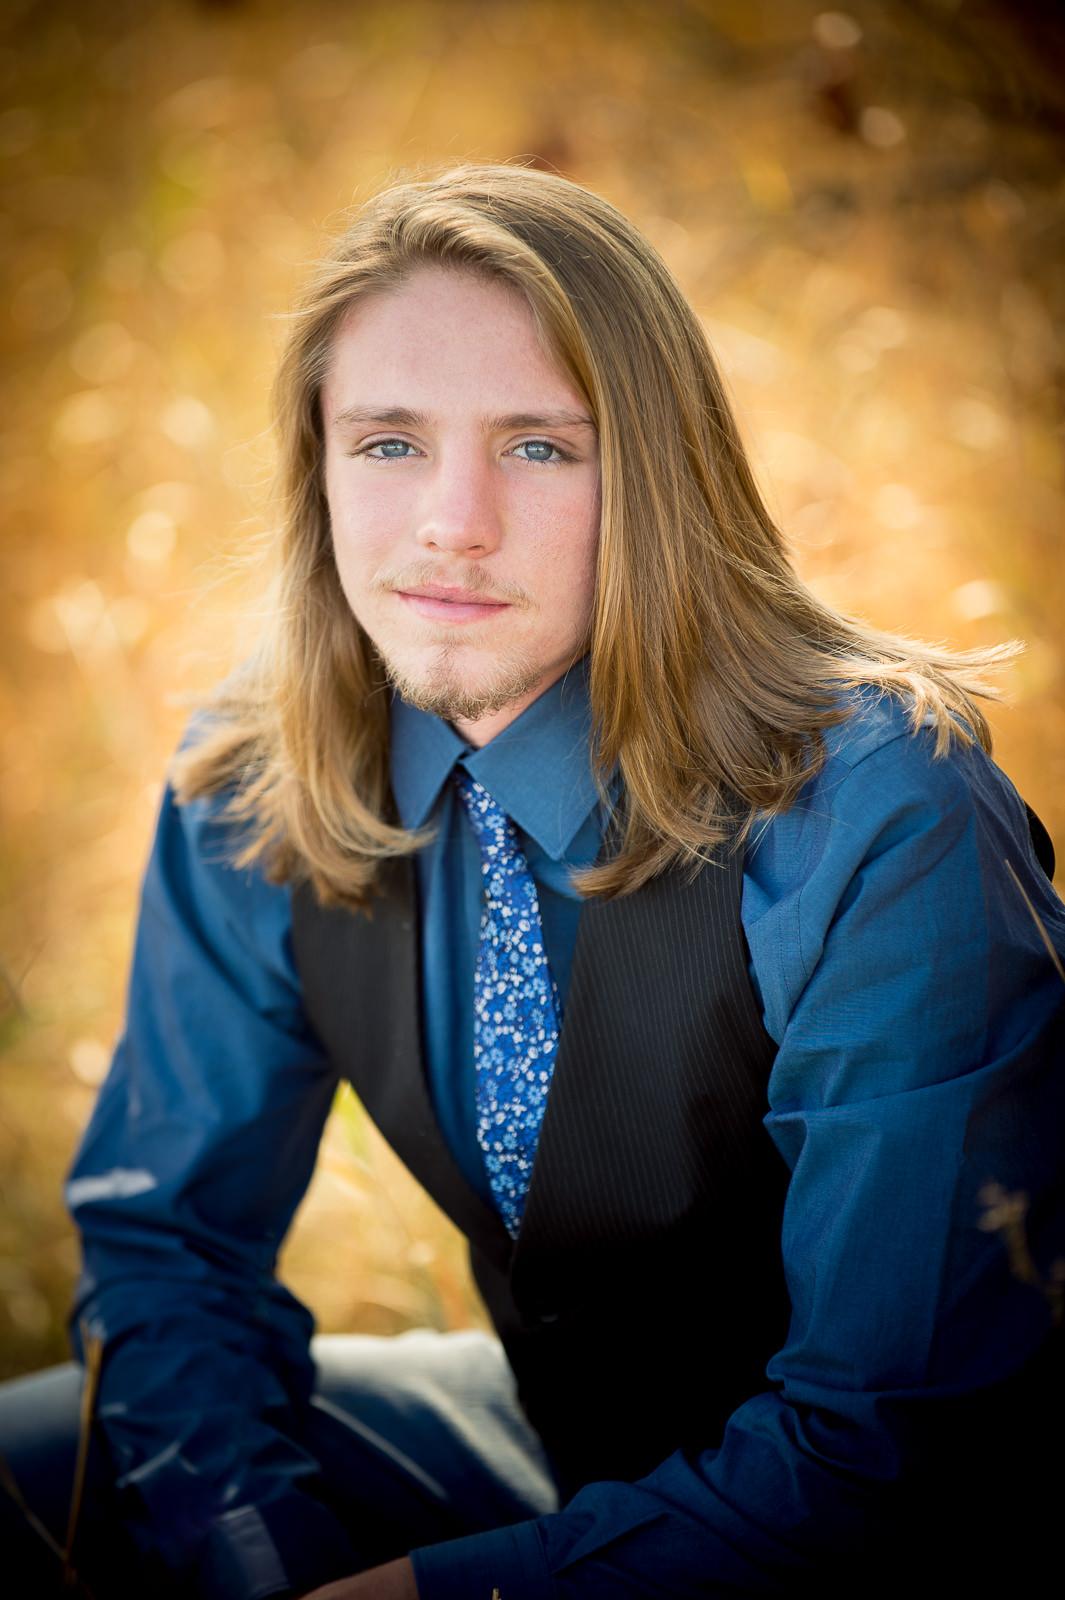 Whitefish High School Senior Portrait Photographer.jpg